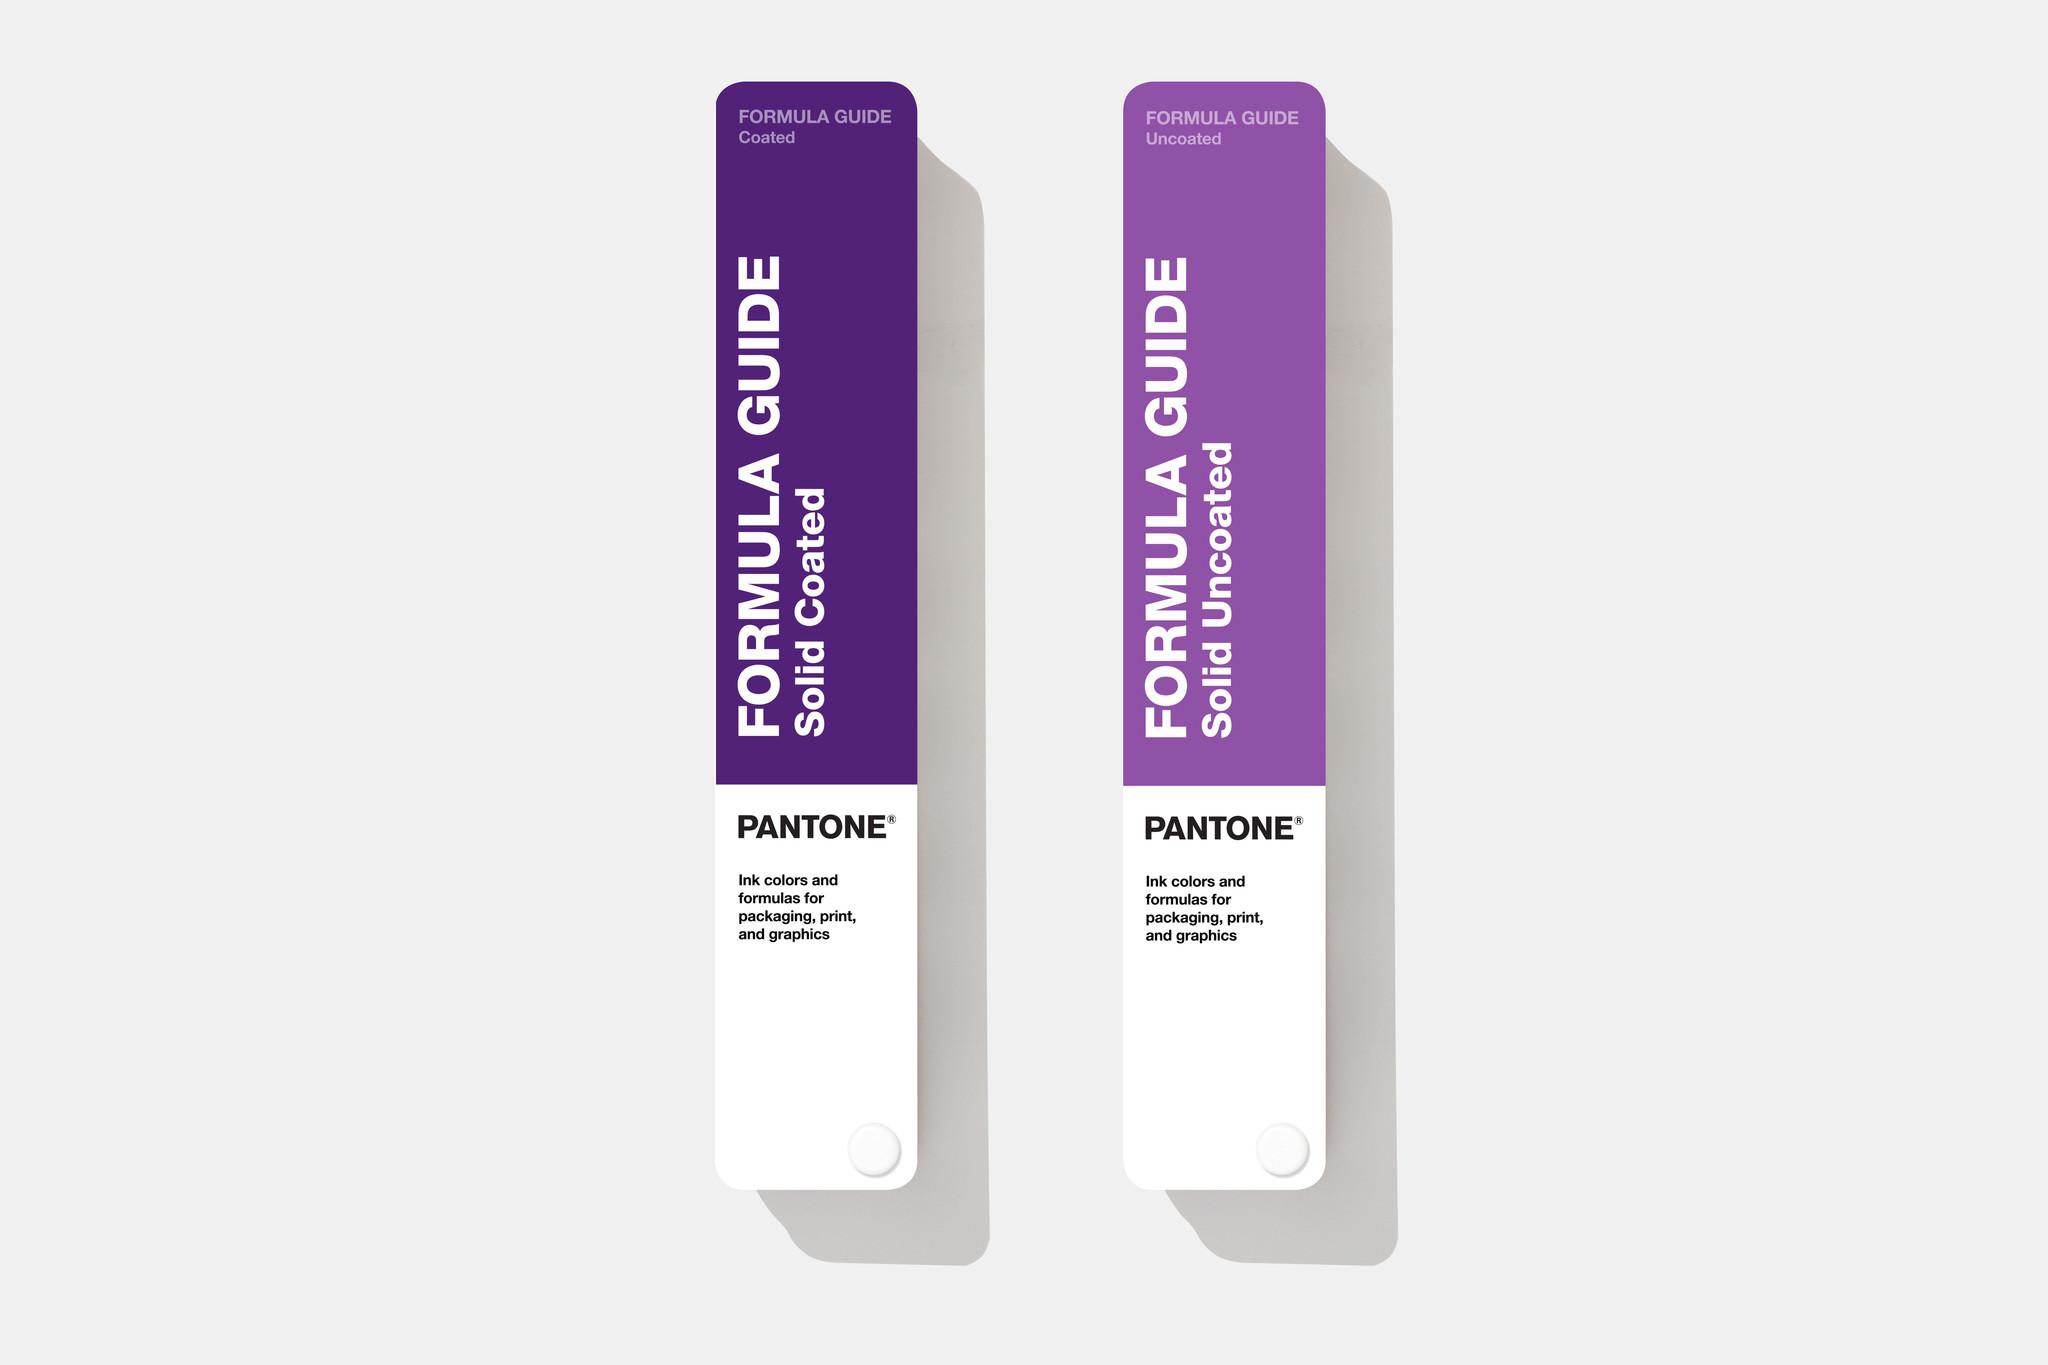 PANTONE PANTONE Solid Color Set